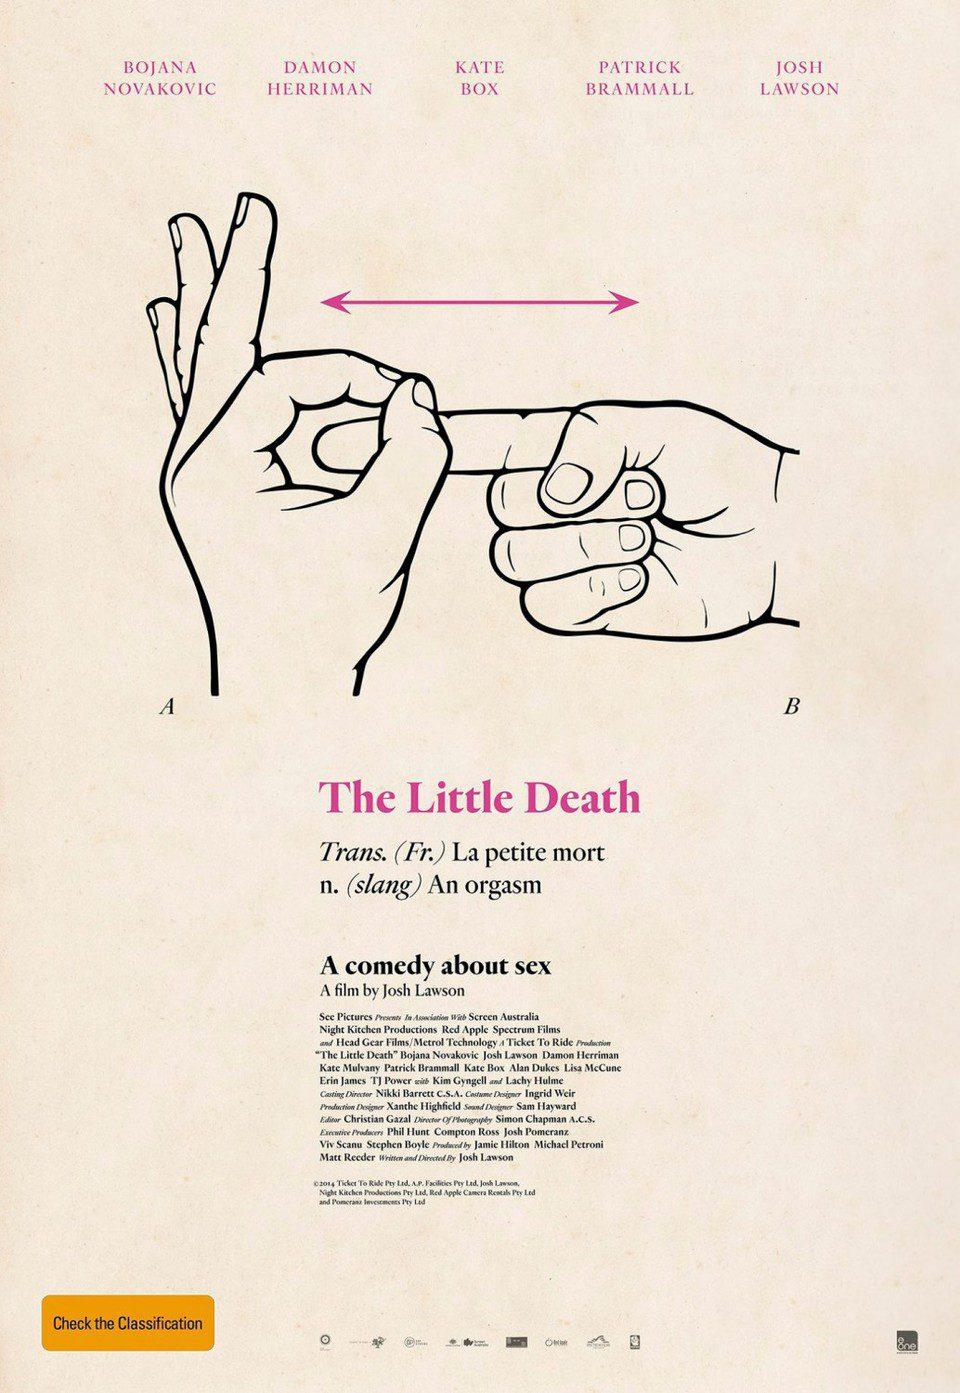 Cartel Estados Unidos de 'The Little Death'